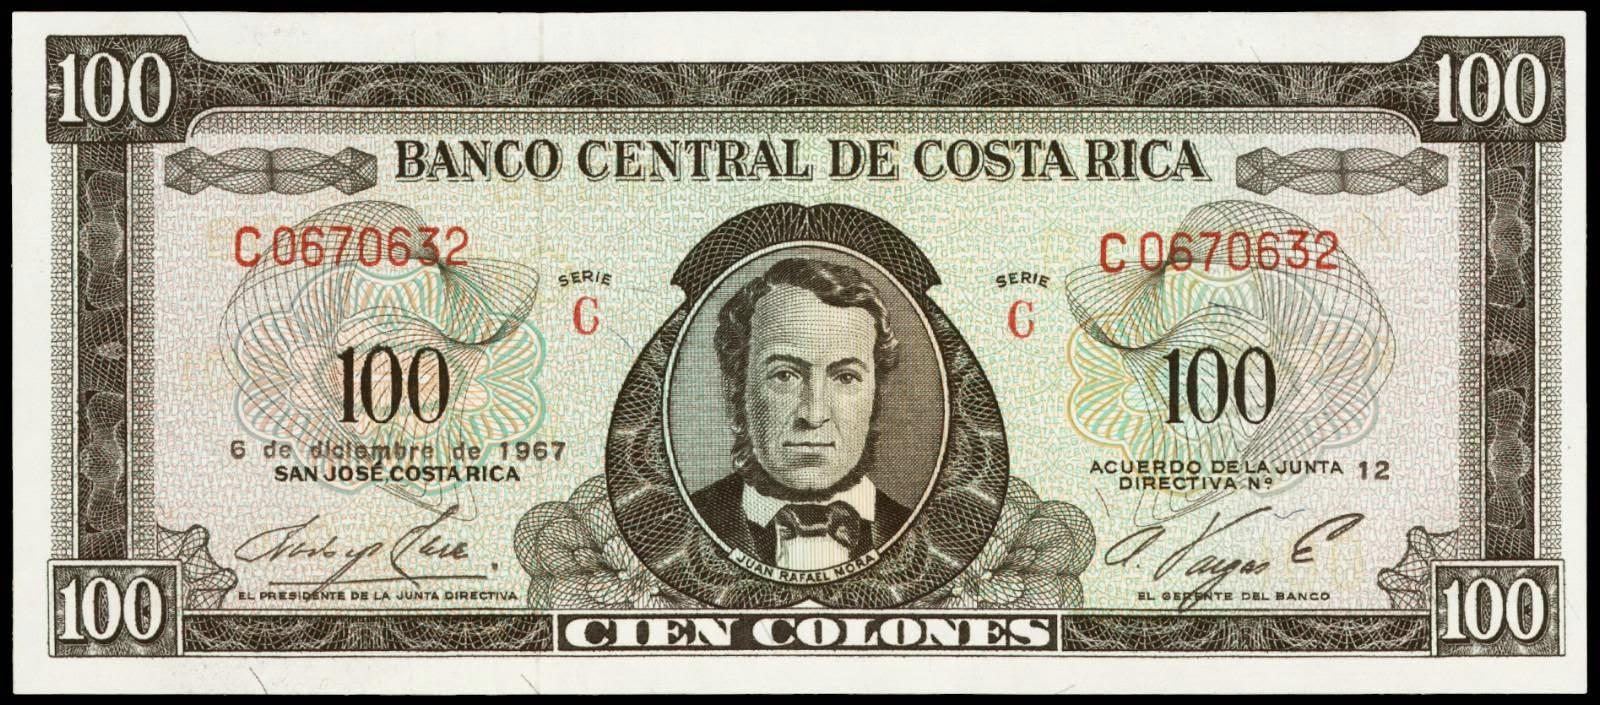 Costa Rica banknotes 100 Colones bank note 1967 Juan Santamaria